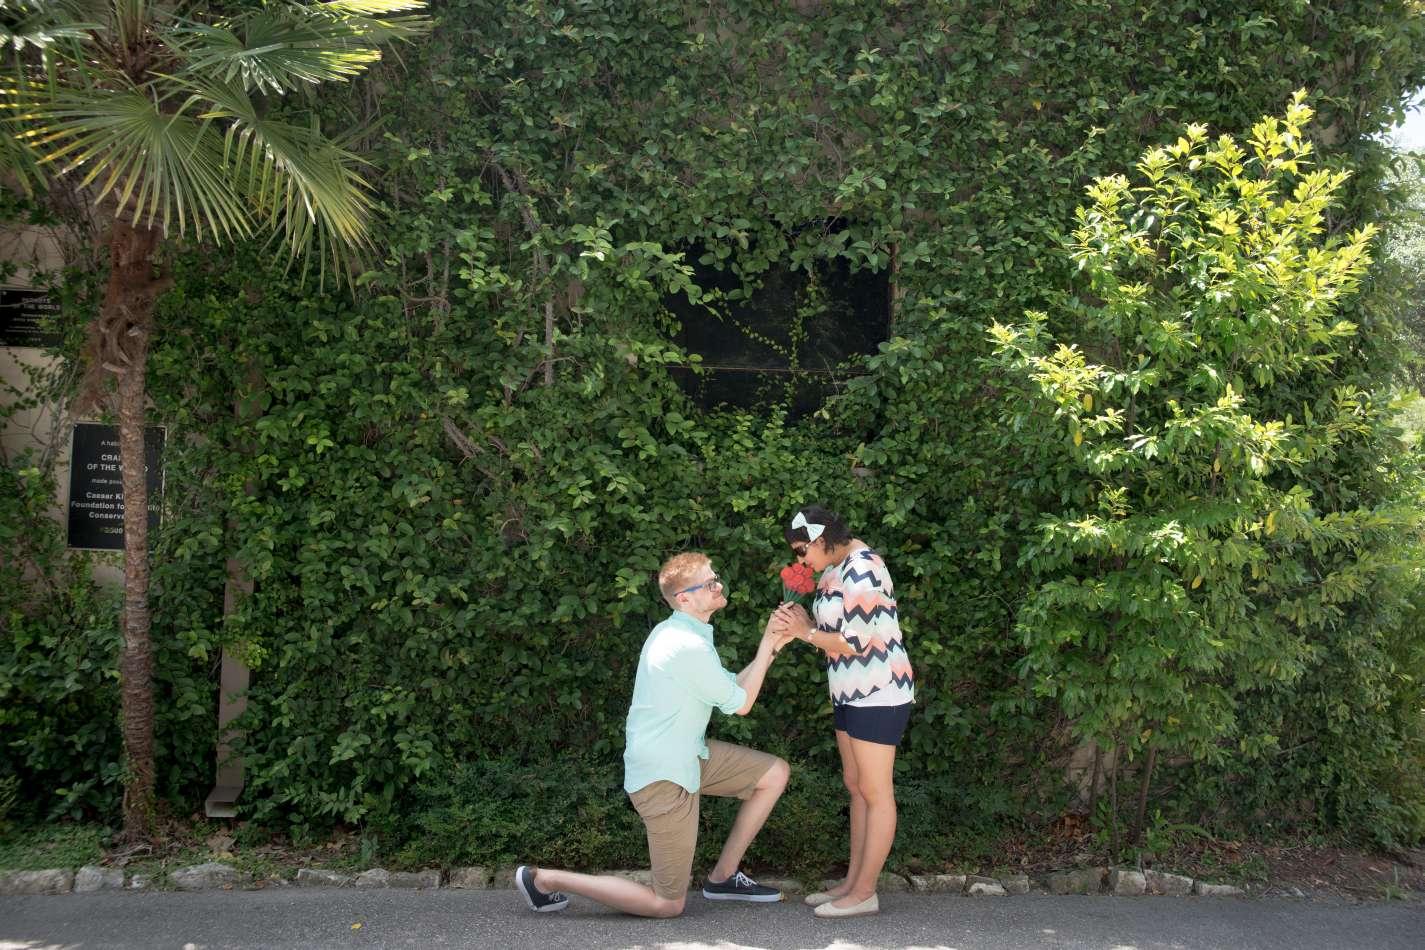 HighDot Studios - Sarah and Zach - Engagement Session - San Antonio - Riverwalk - San Antonio Zoo (20)